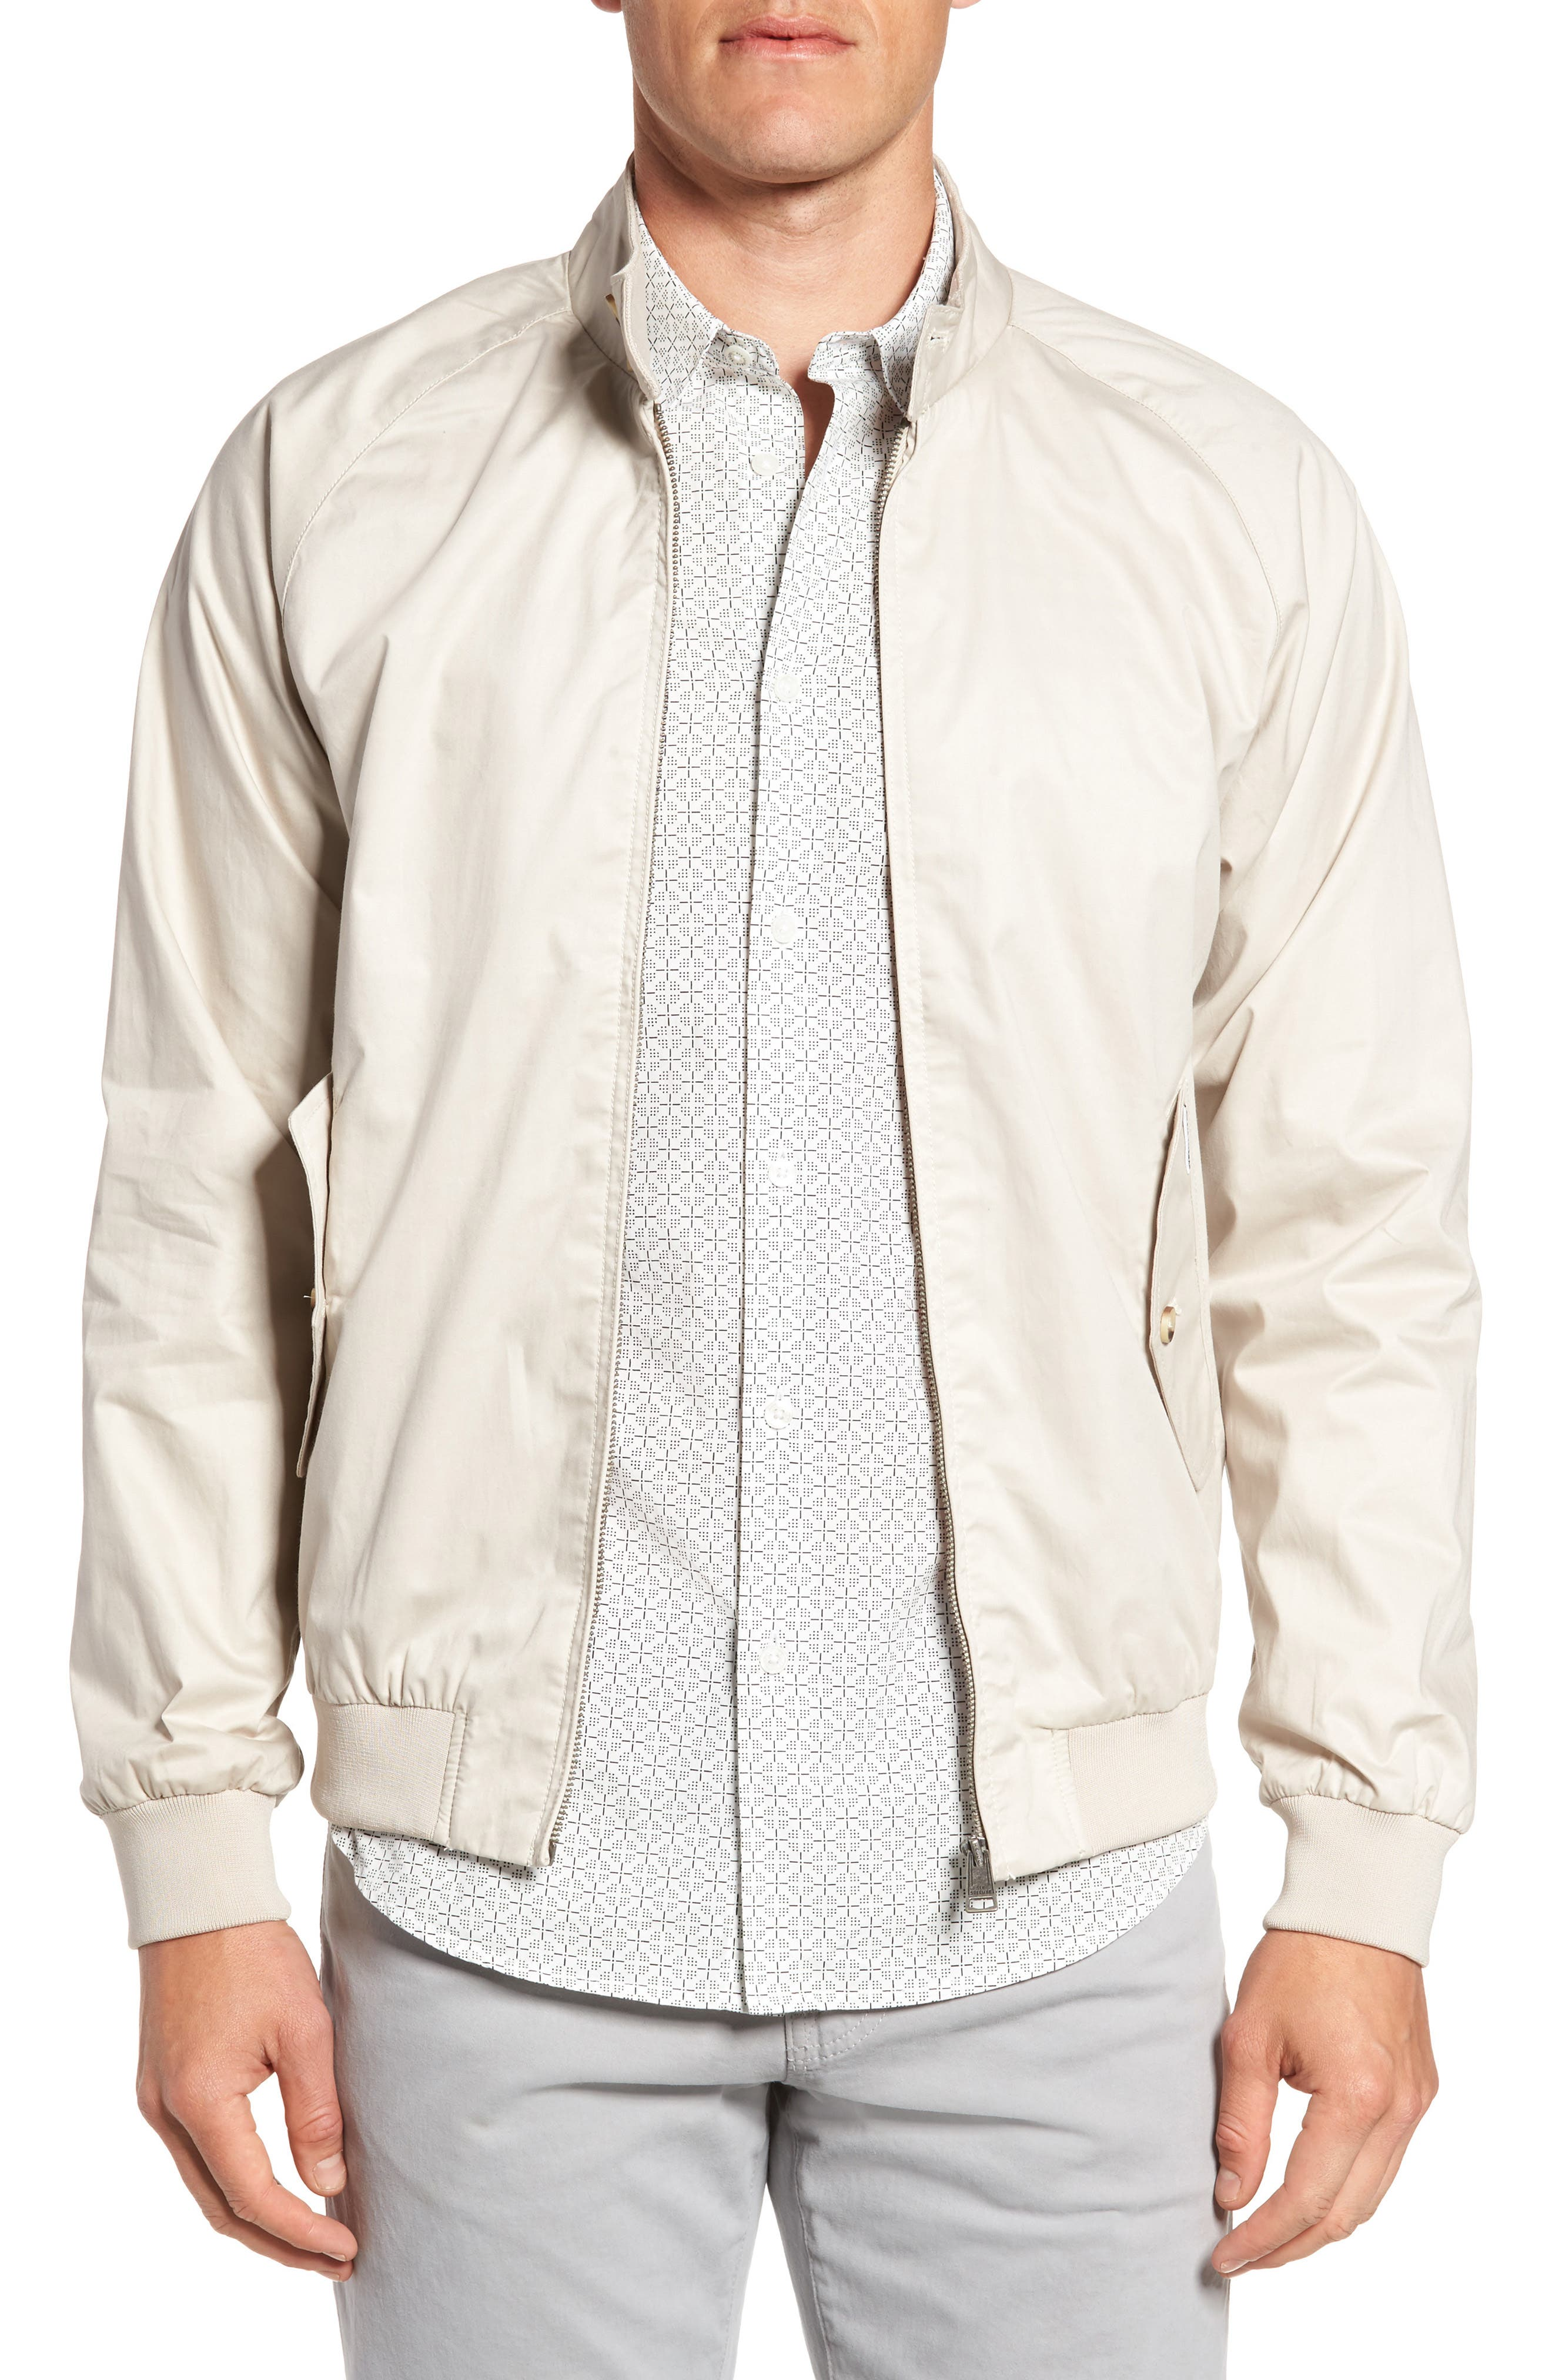 Ben Sherman Core Harrington Jacket